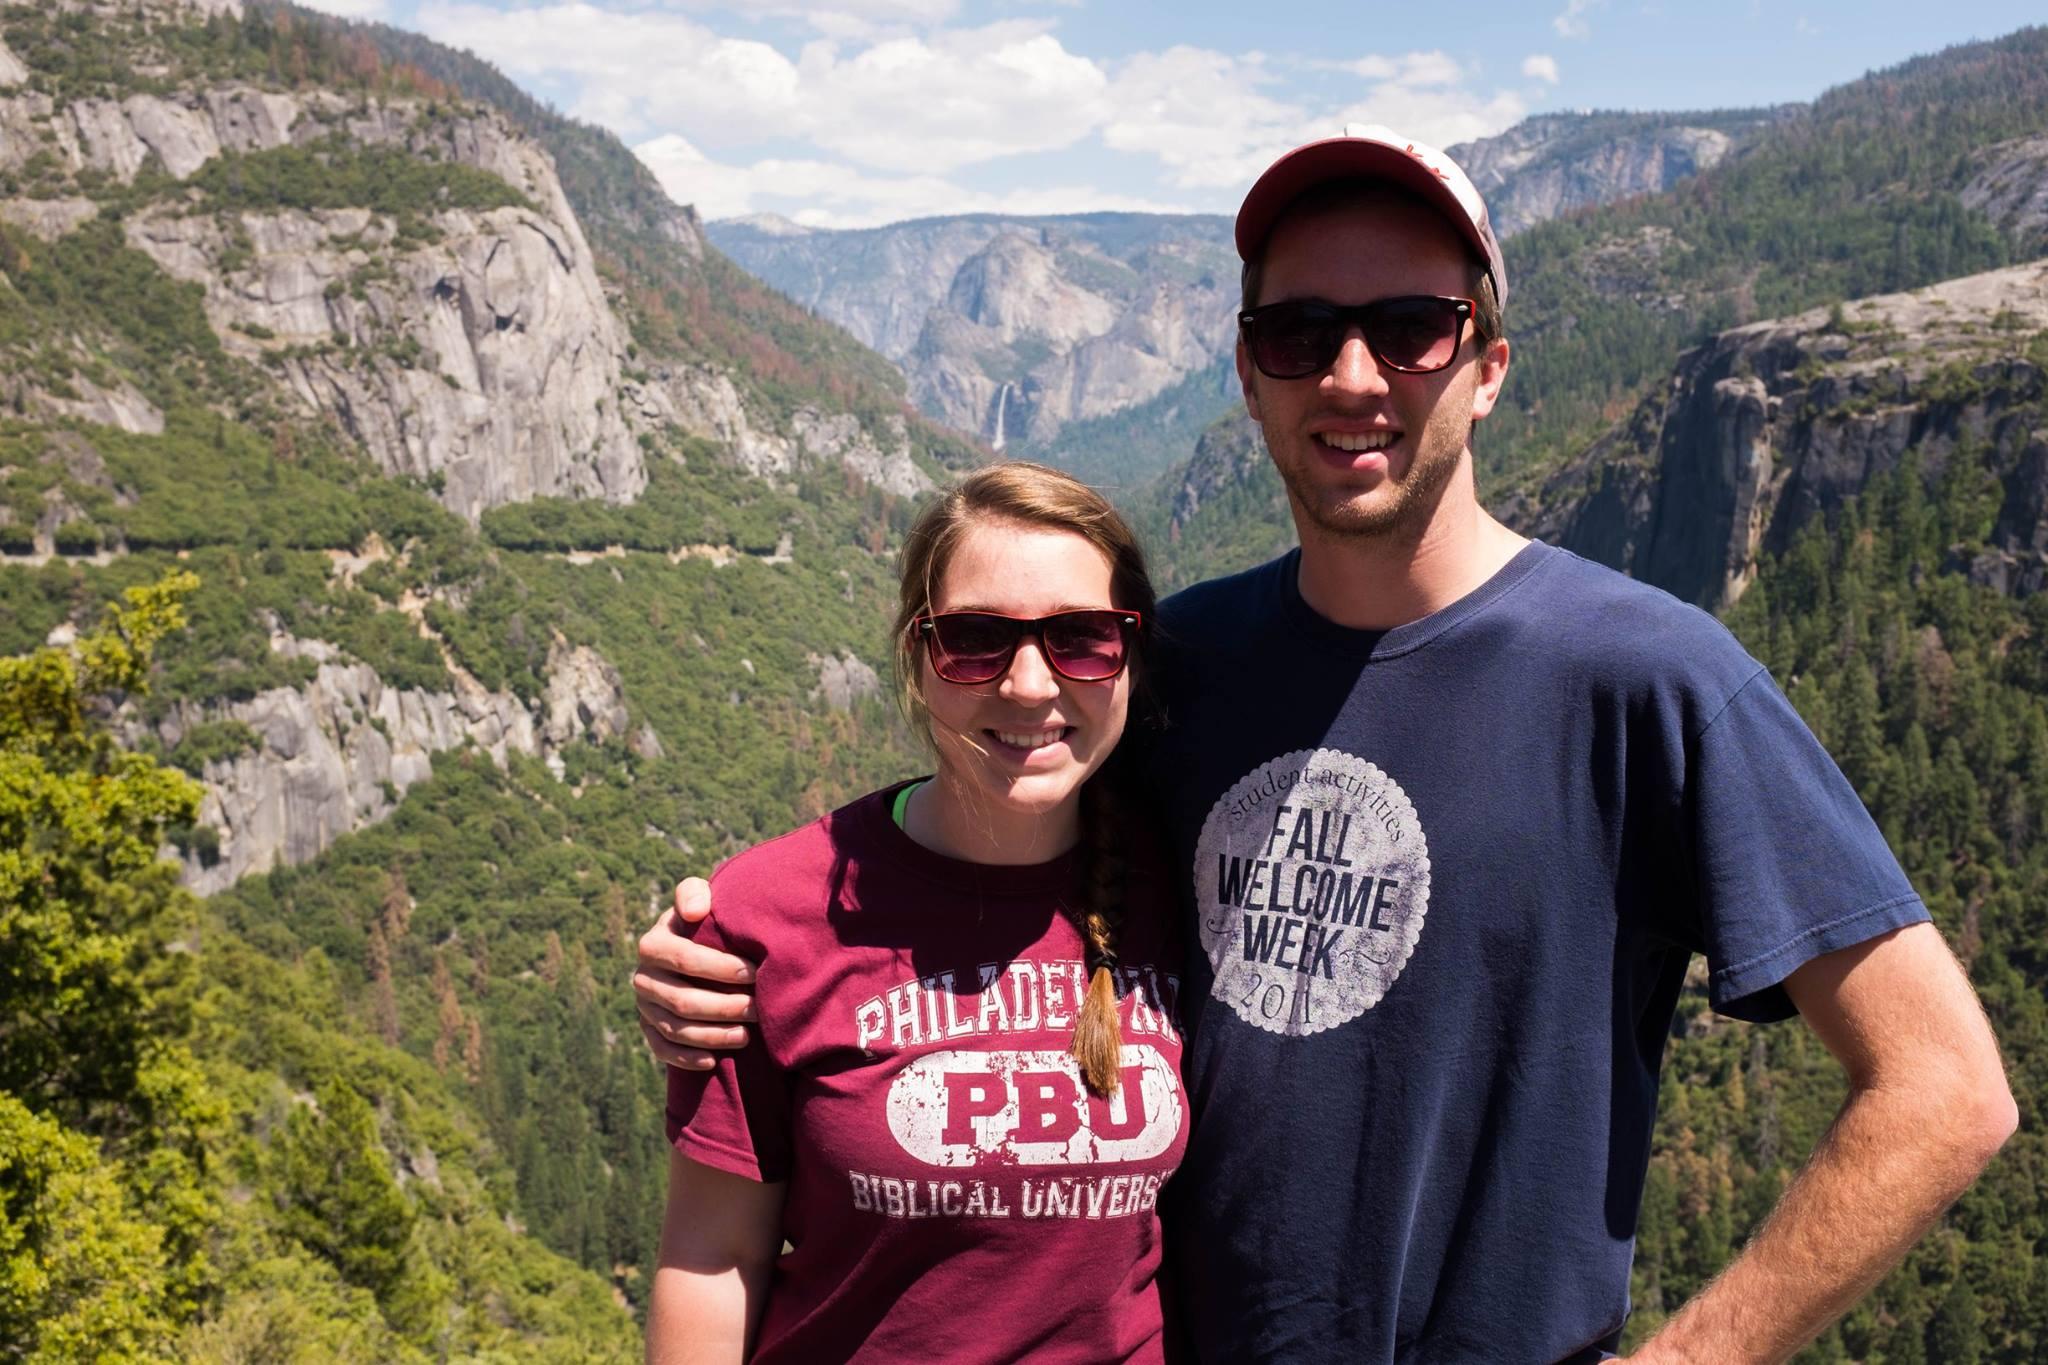 KaitlynBeckerPhotography_Yosemite_Travel_Adventure_PersonalBrandImagery_MarketingPhotographer_FamiliesPortraitsMemphisTN